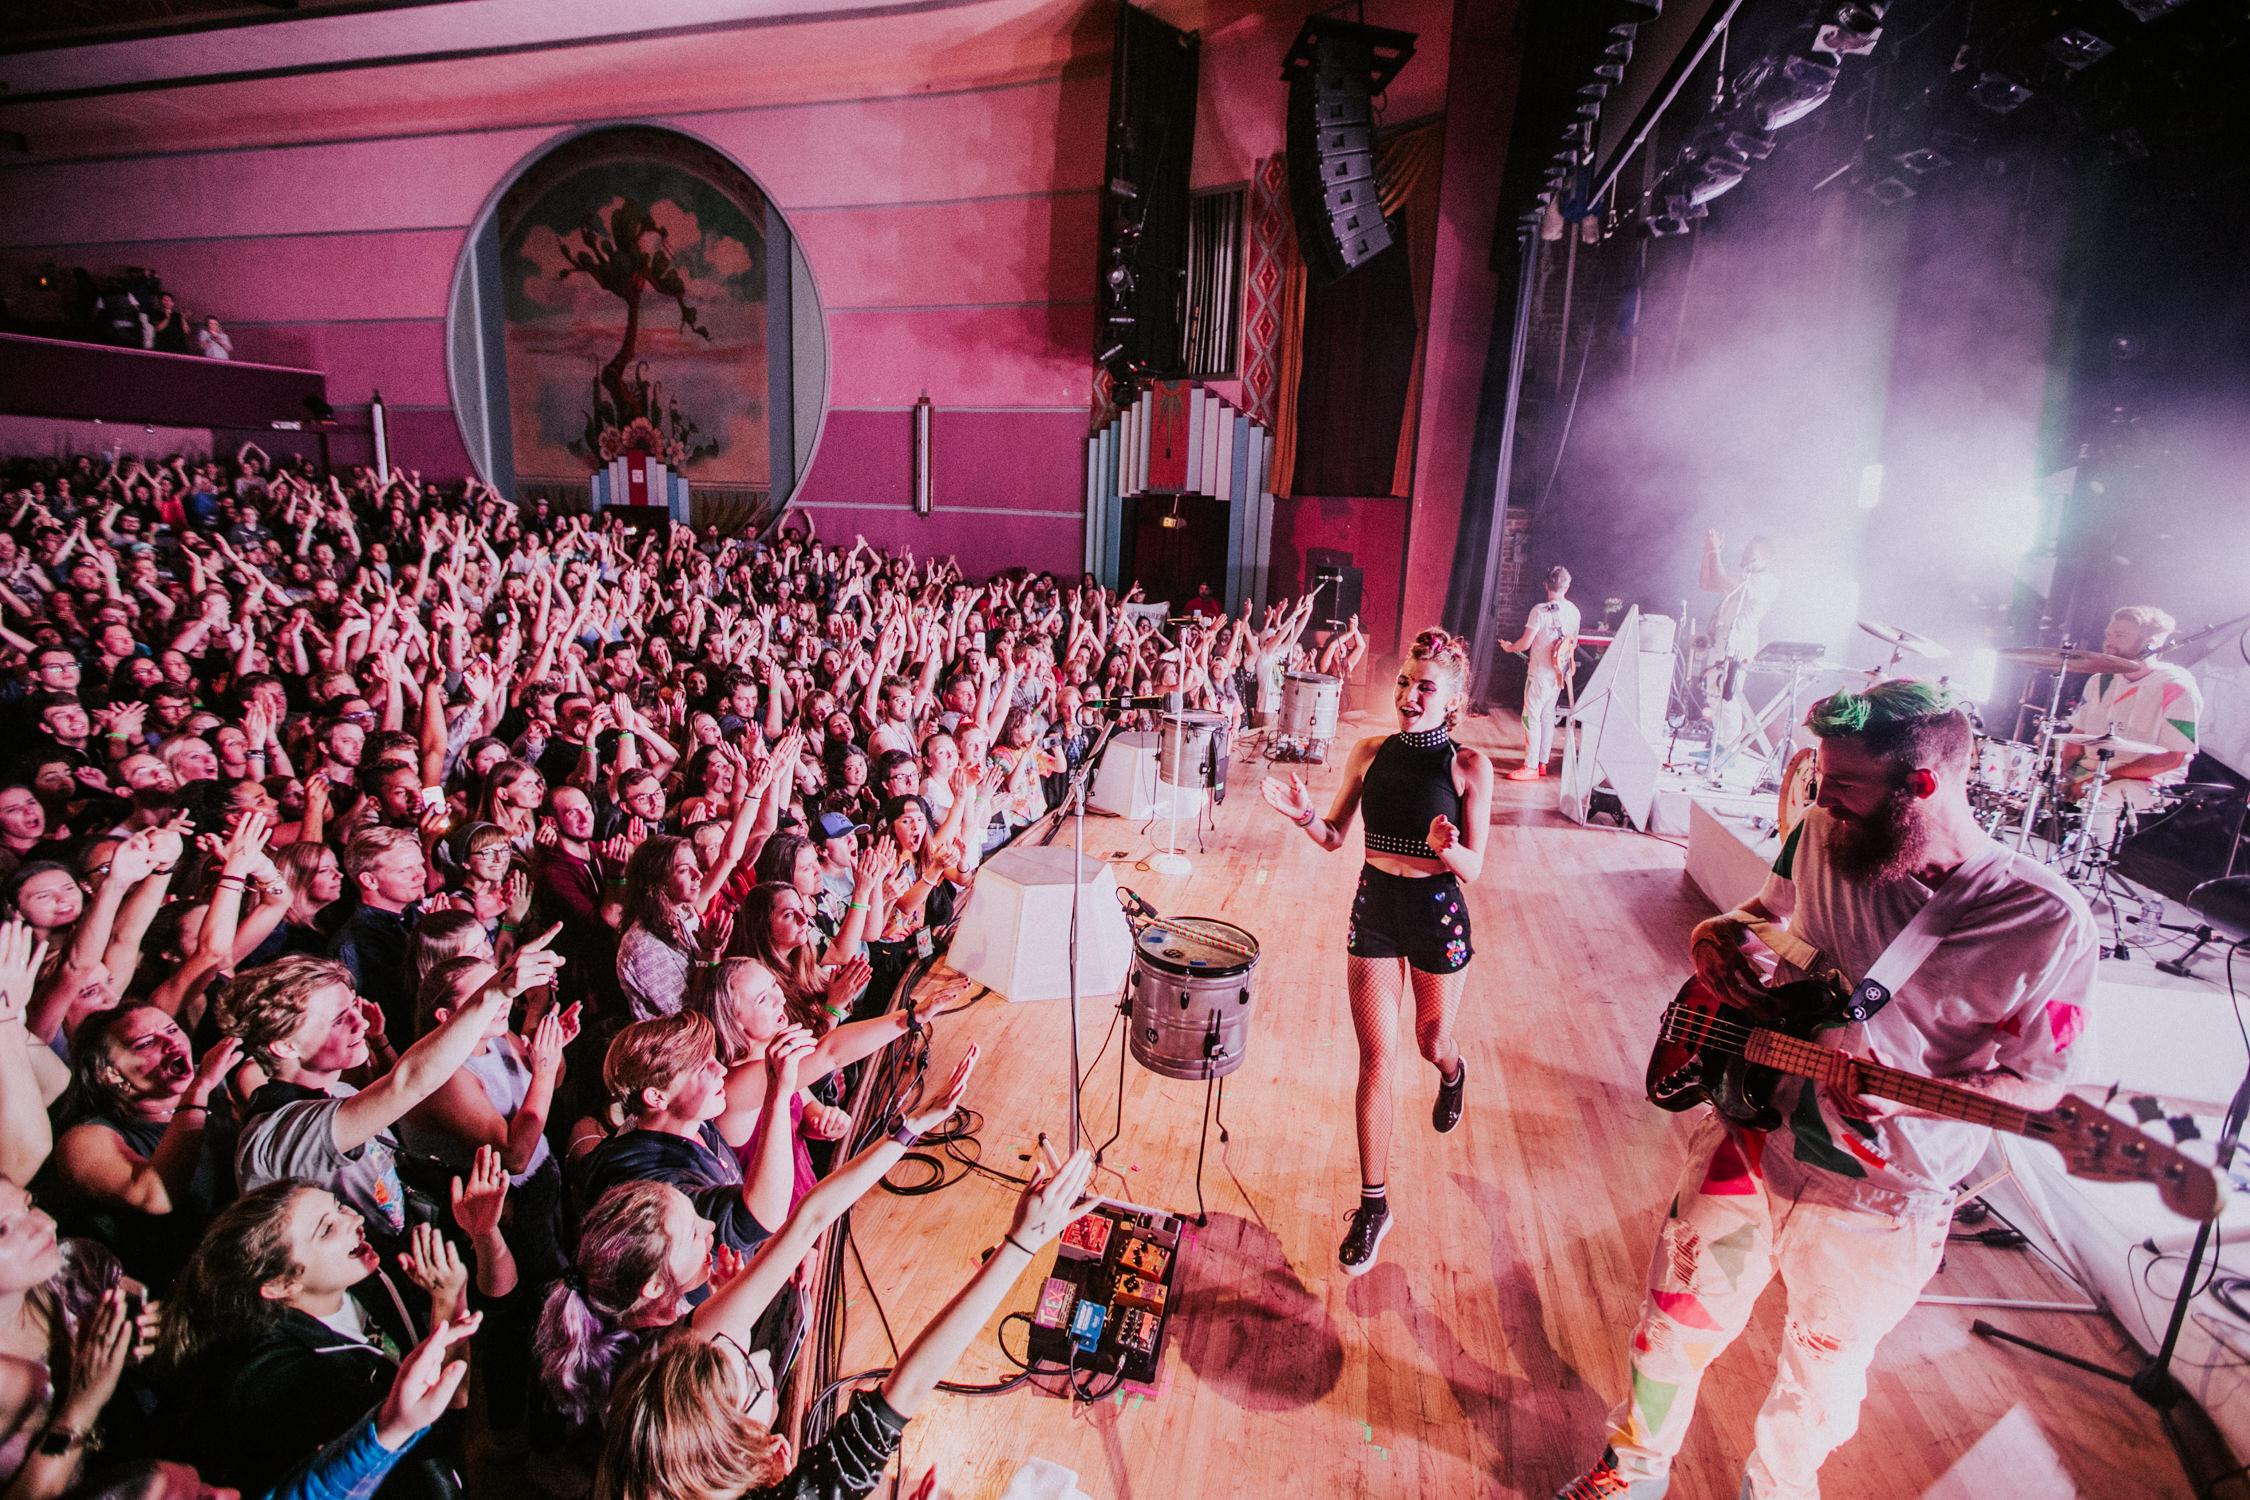 misterwives-tour-large-crowd-the-depot-venue-AnnaLeeMedia